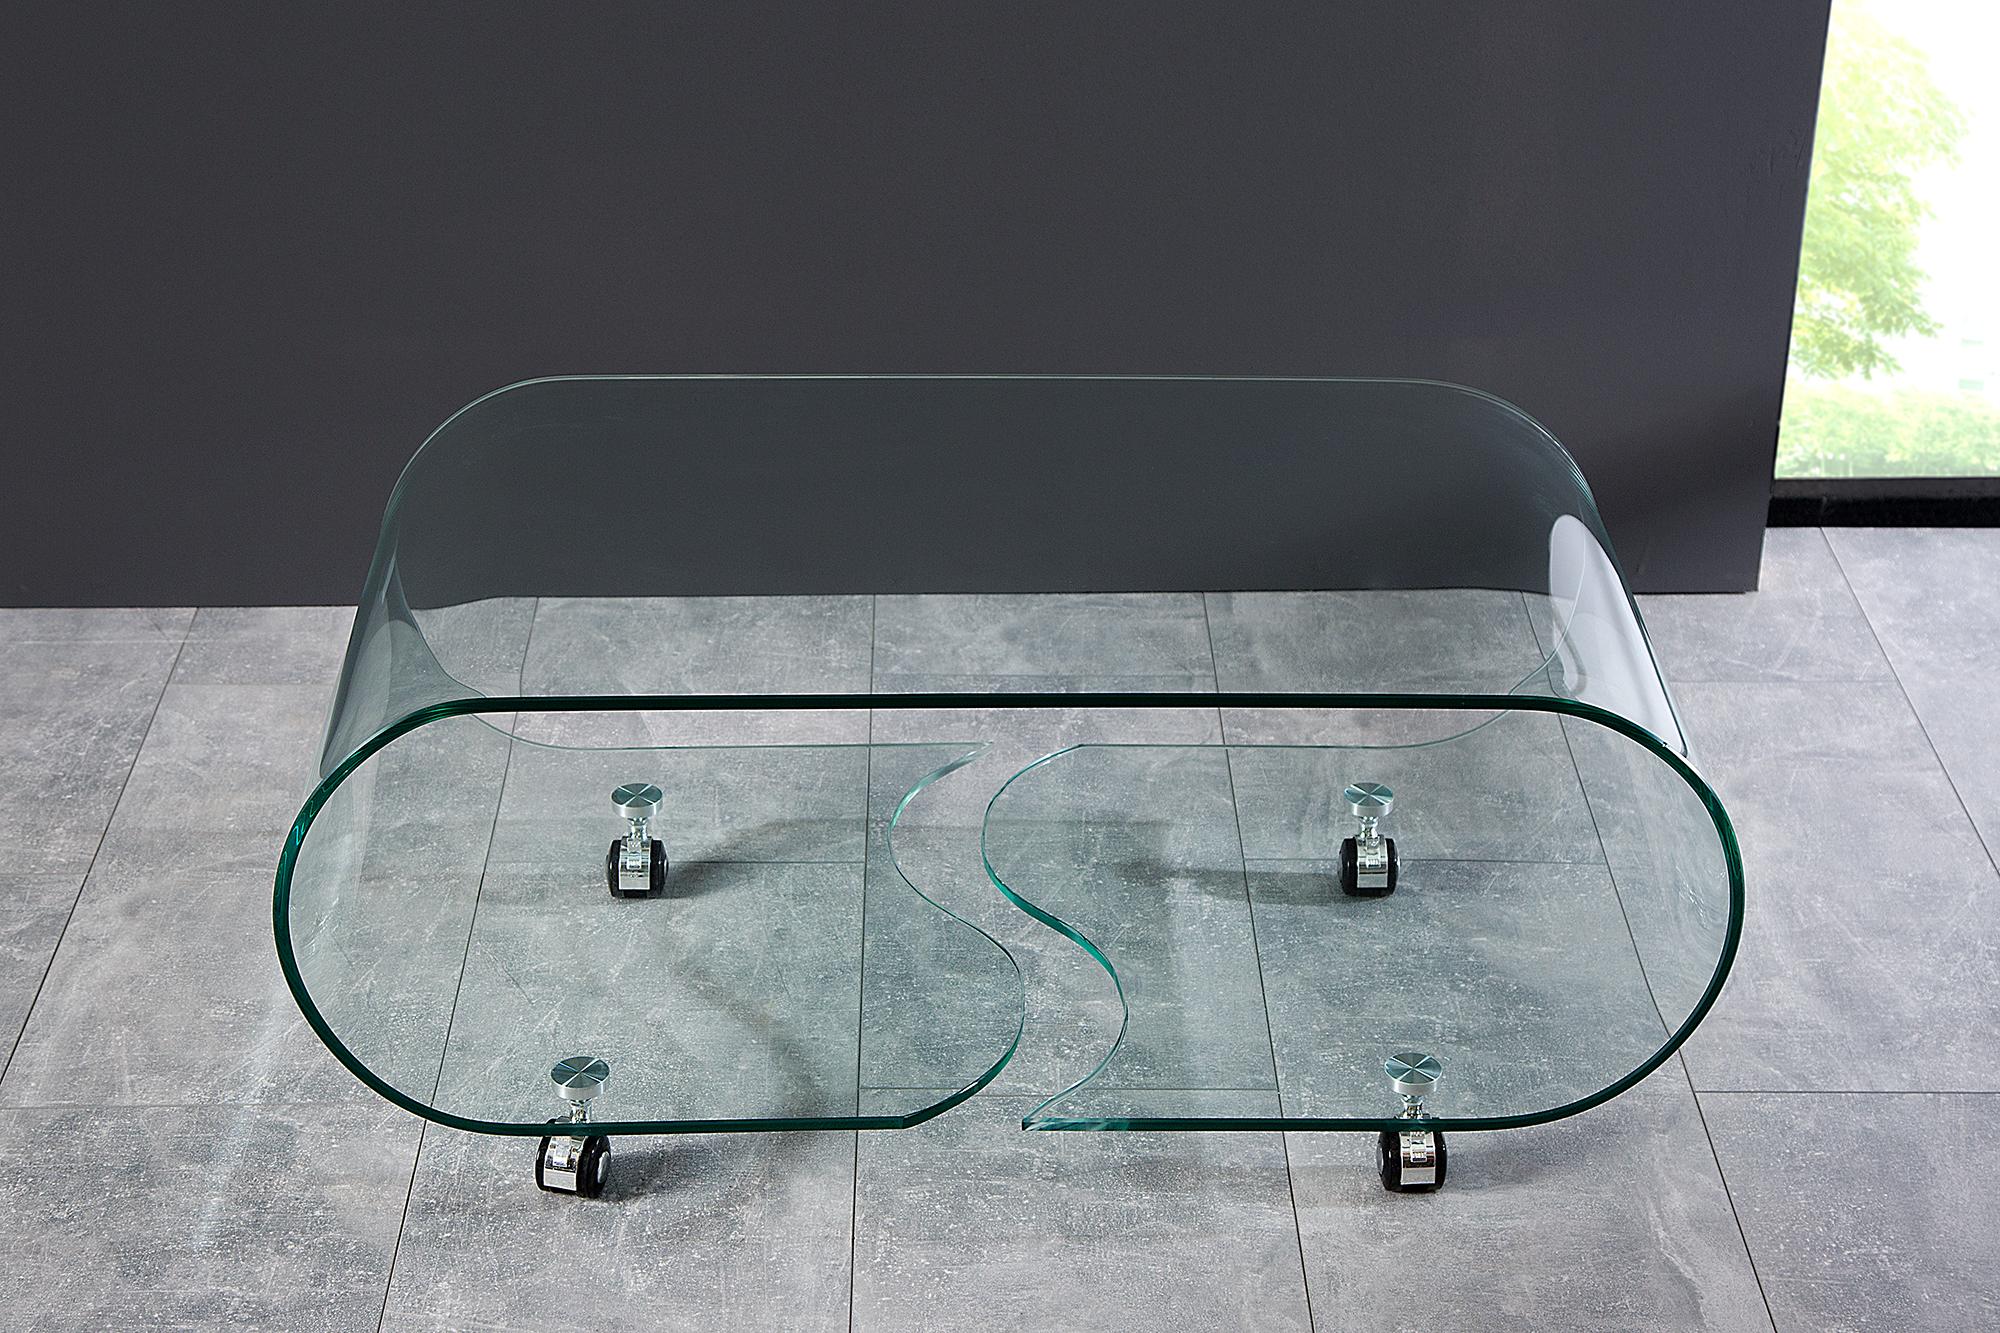 Glazen Salon Tafel.Glazen Salontafels Kopen Aktie Wonen Nl